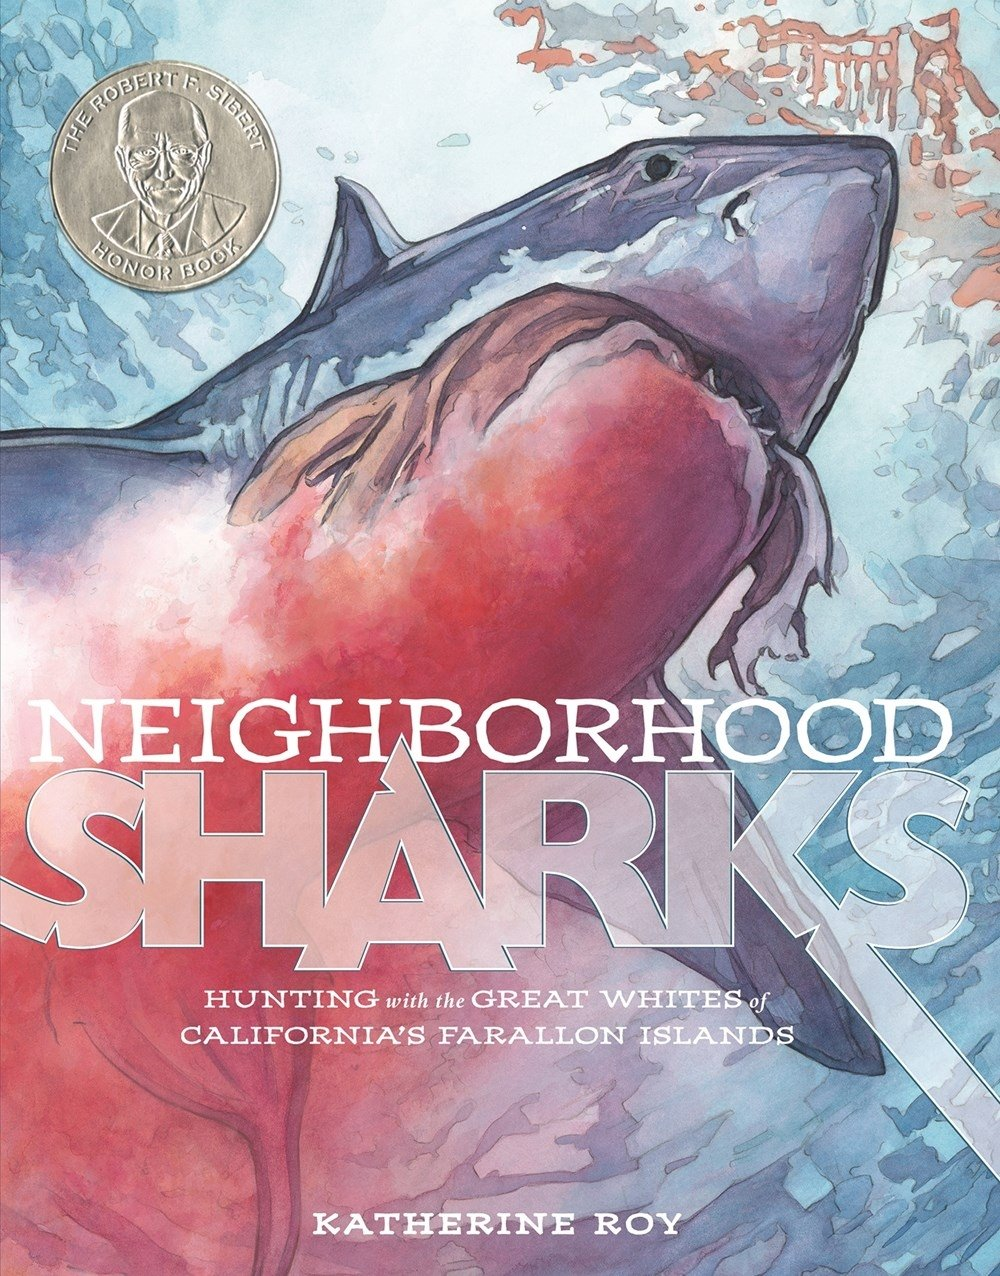 Neighborhood Sharks: Hunting with the Great Whites of California's Farallon Islands: Katherine Roy, Katherine Roy: 9781596438743: Amazon.com: Books